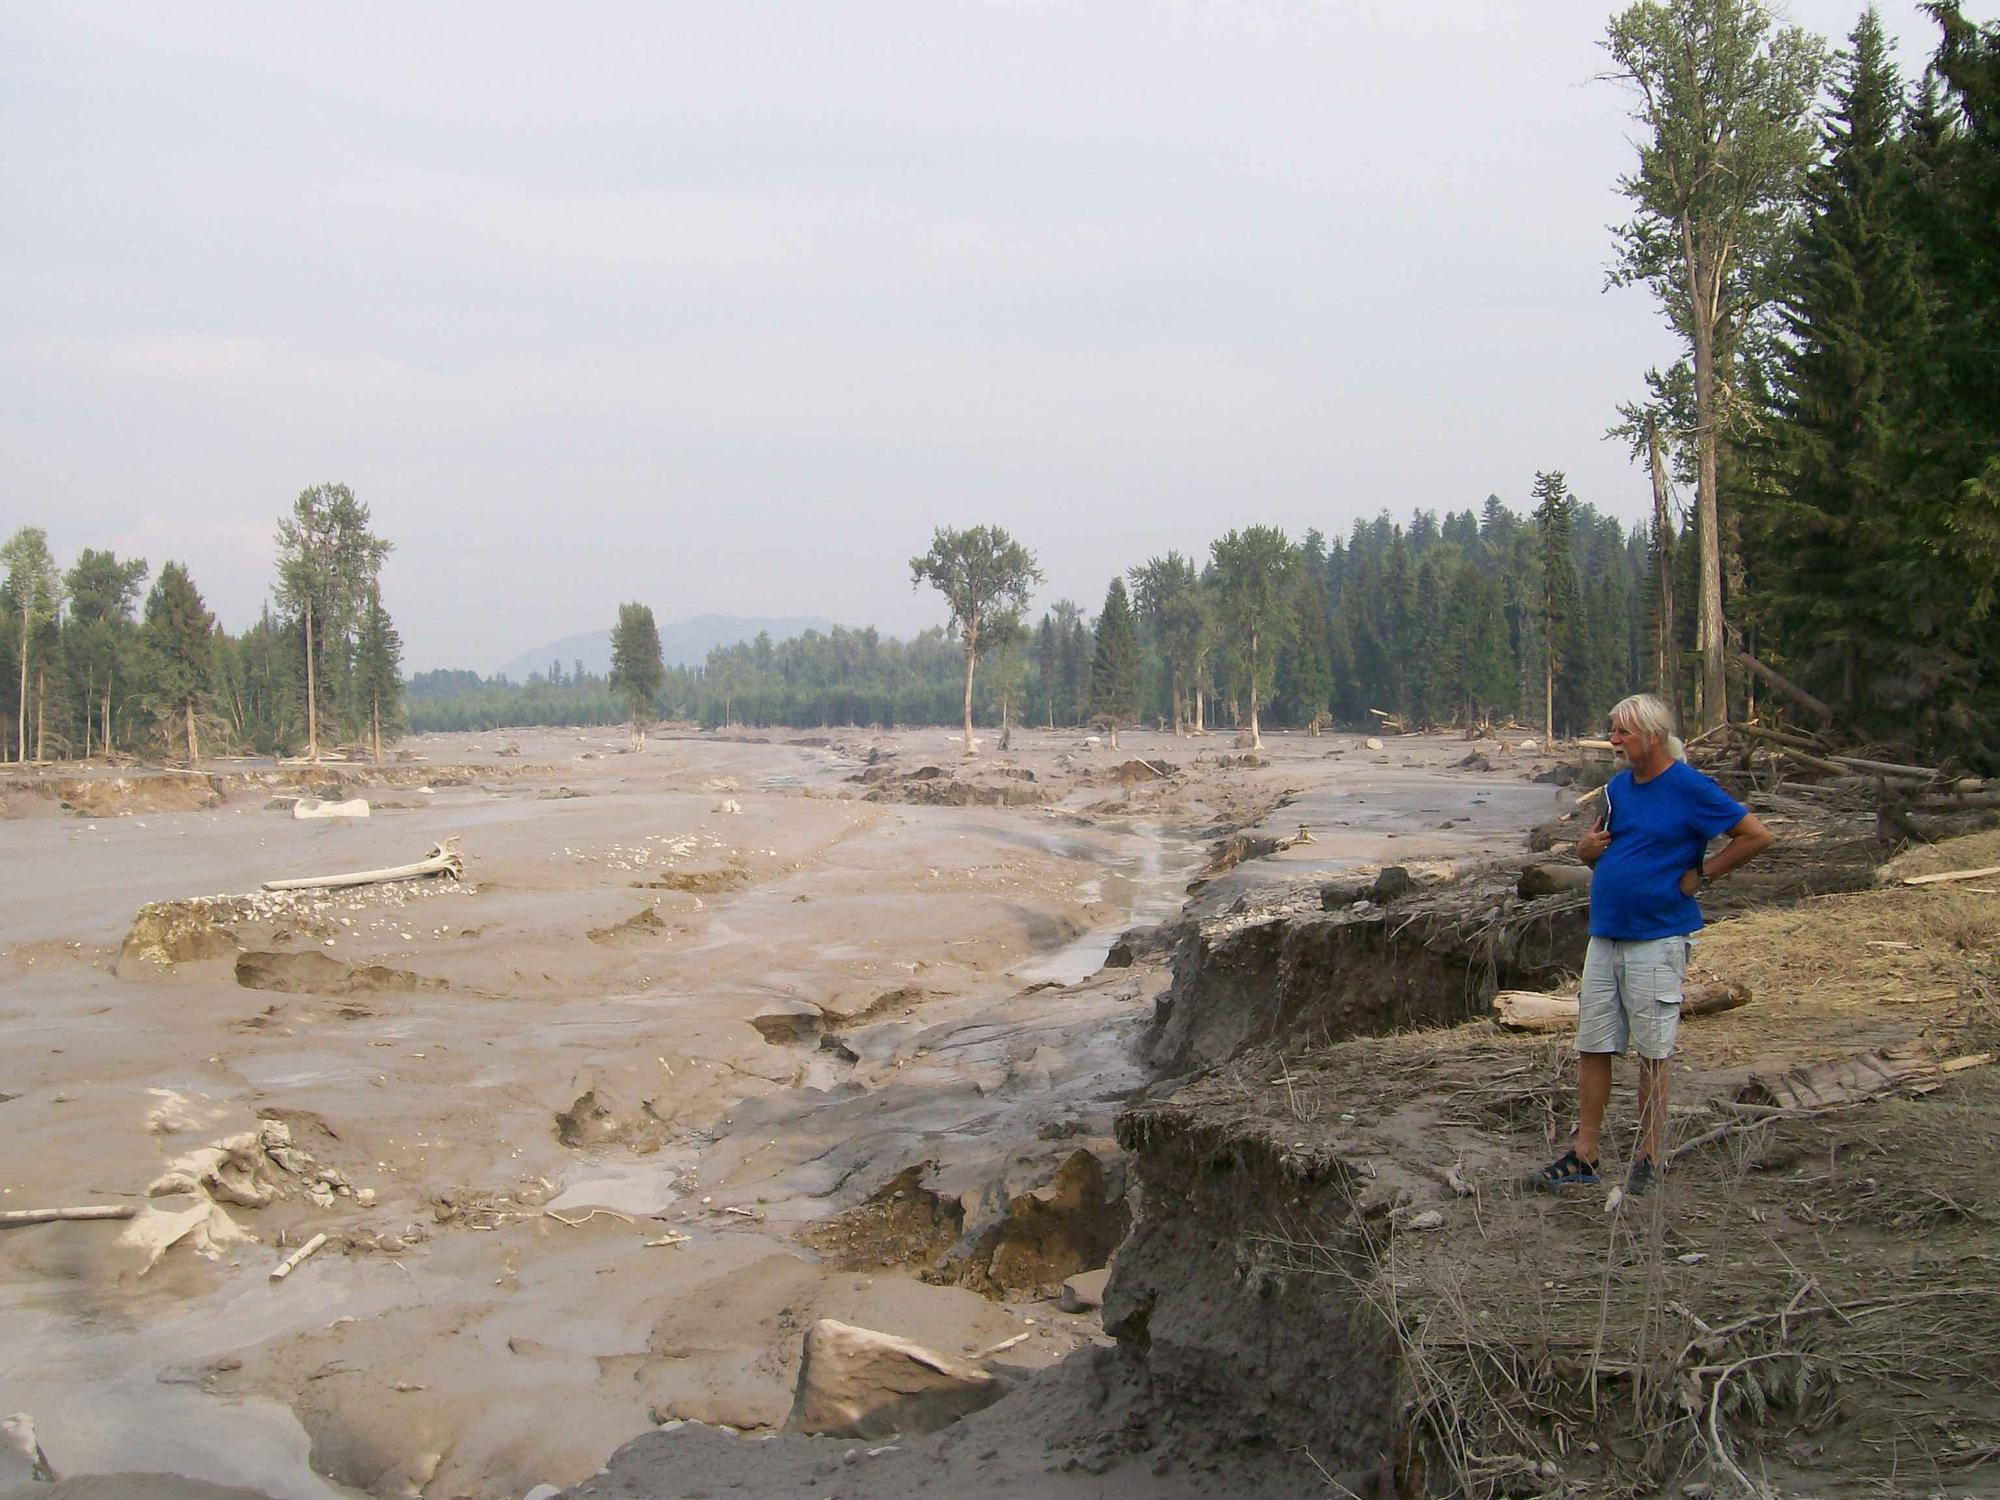 Mount Polley Massive Mine Waste Spill, 2014